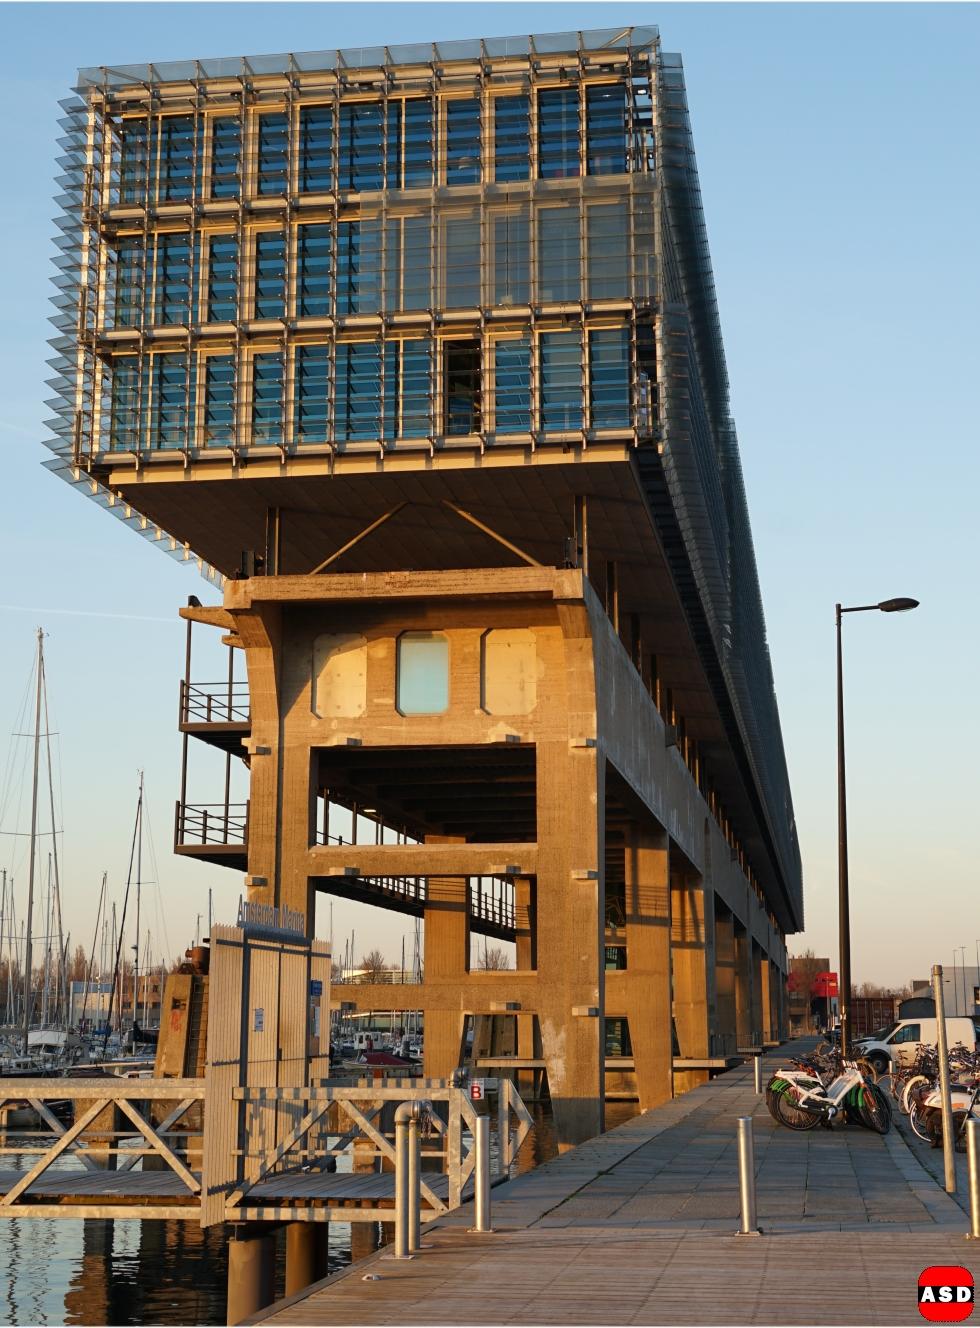 Amsterdam Noord, Shipyard